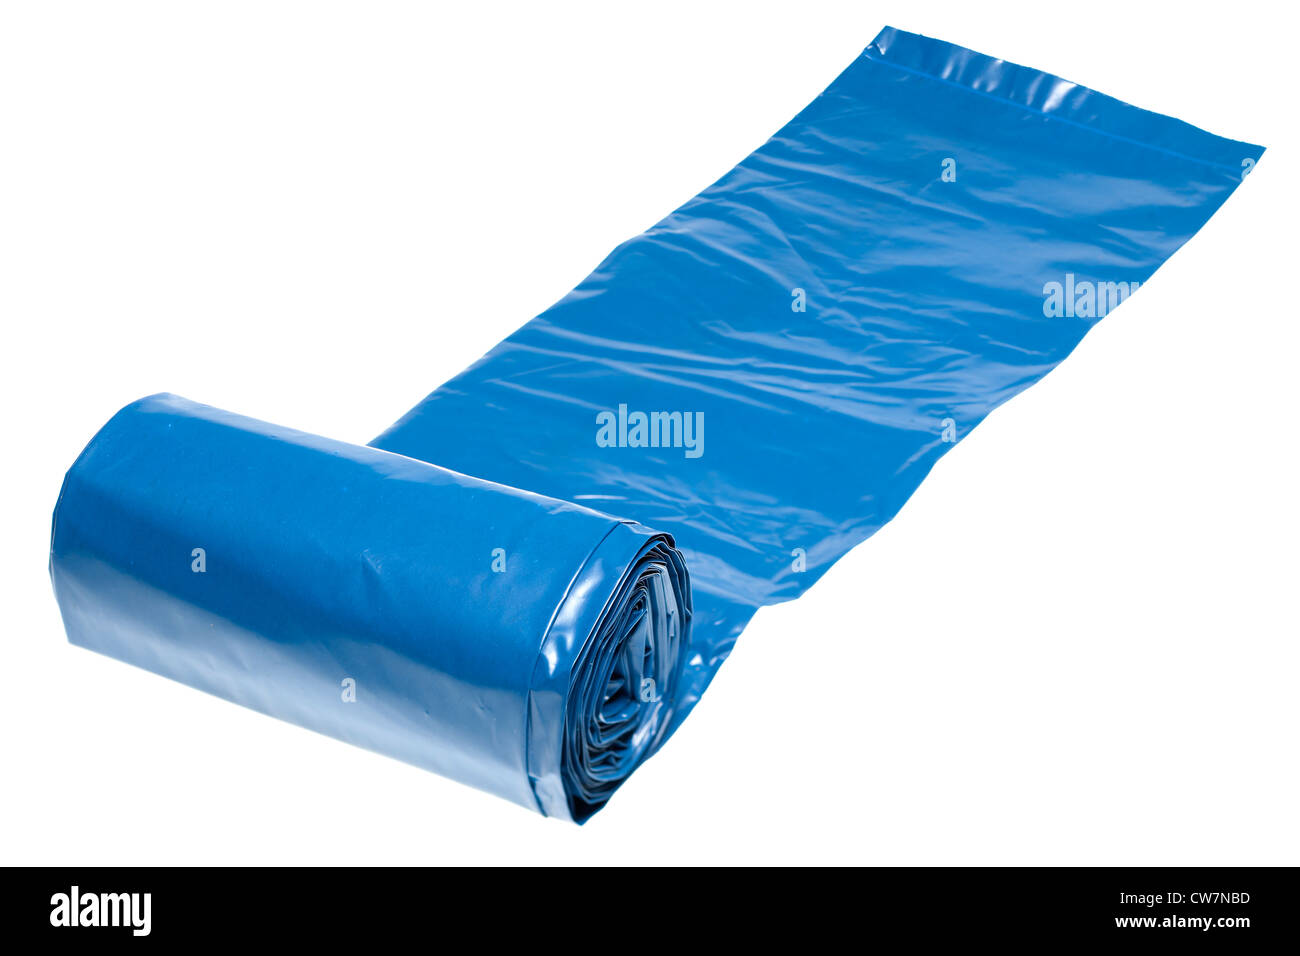 Roll of blue heavy duty rubble polythene sacks - Stock Image